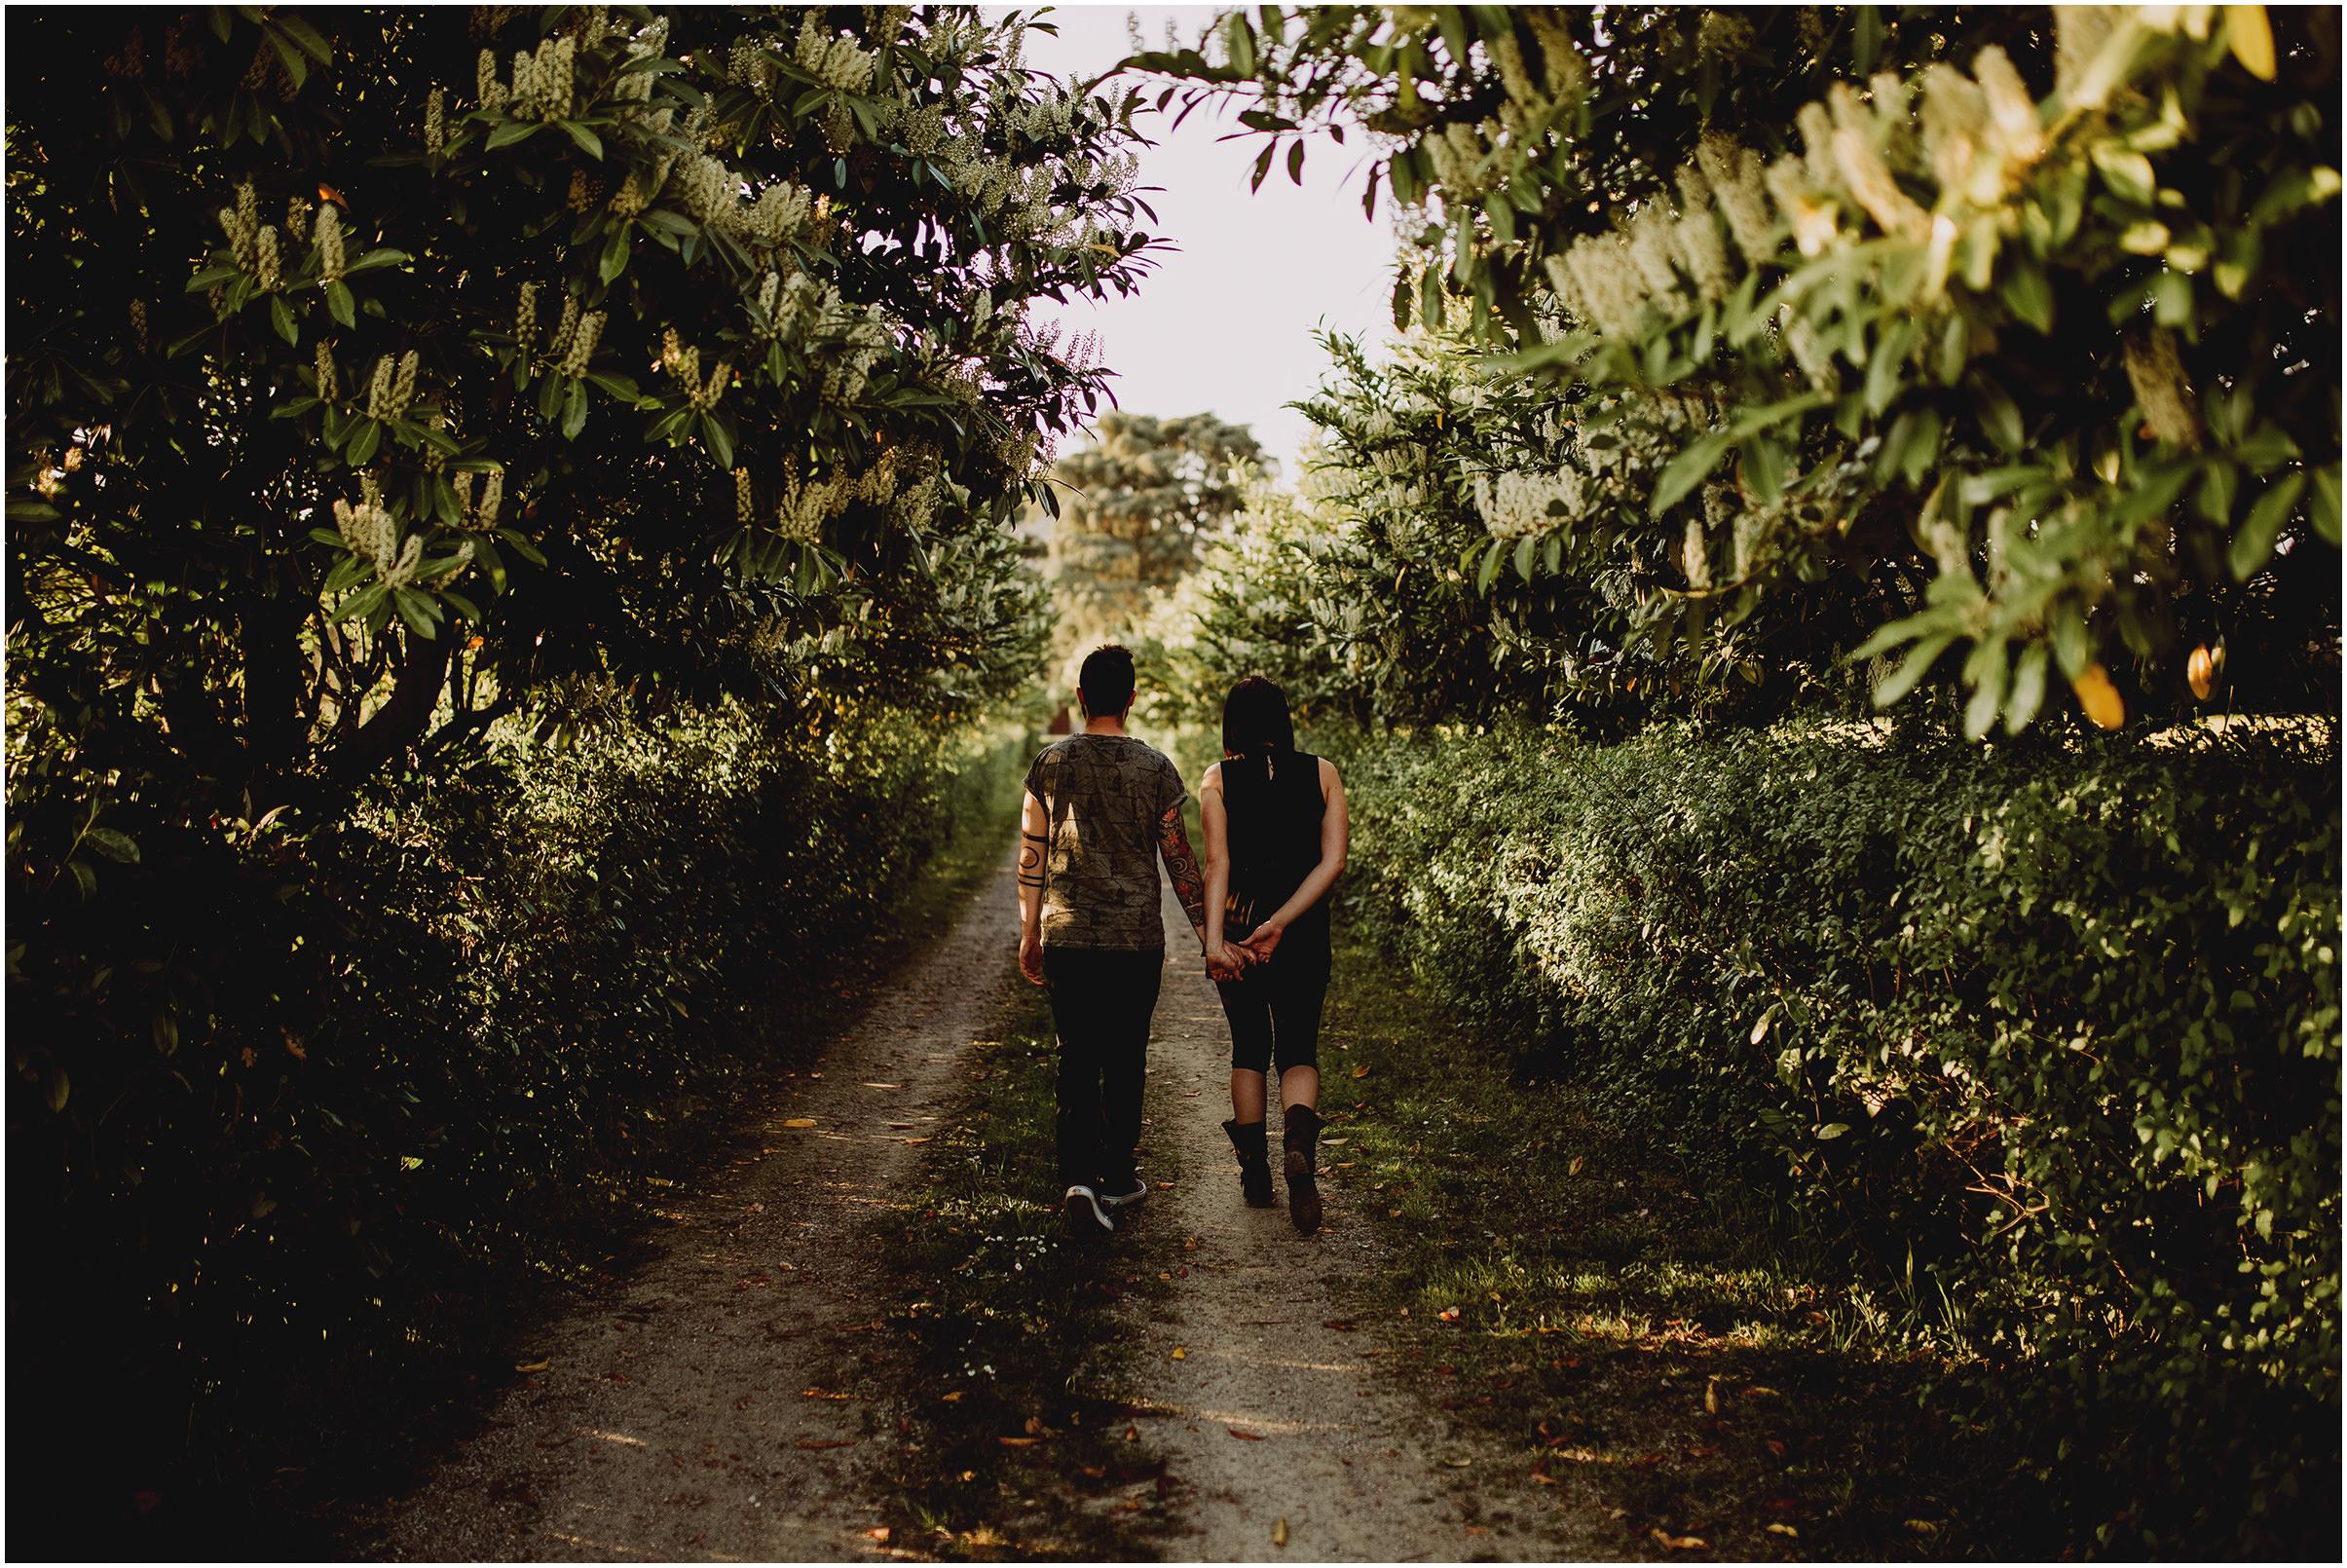 coppia-lovesession-marta-nicola-sara-lorenzoni-fotografia-wedding-matrimonio-arezzo-03